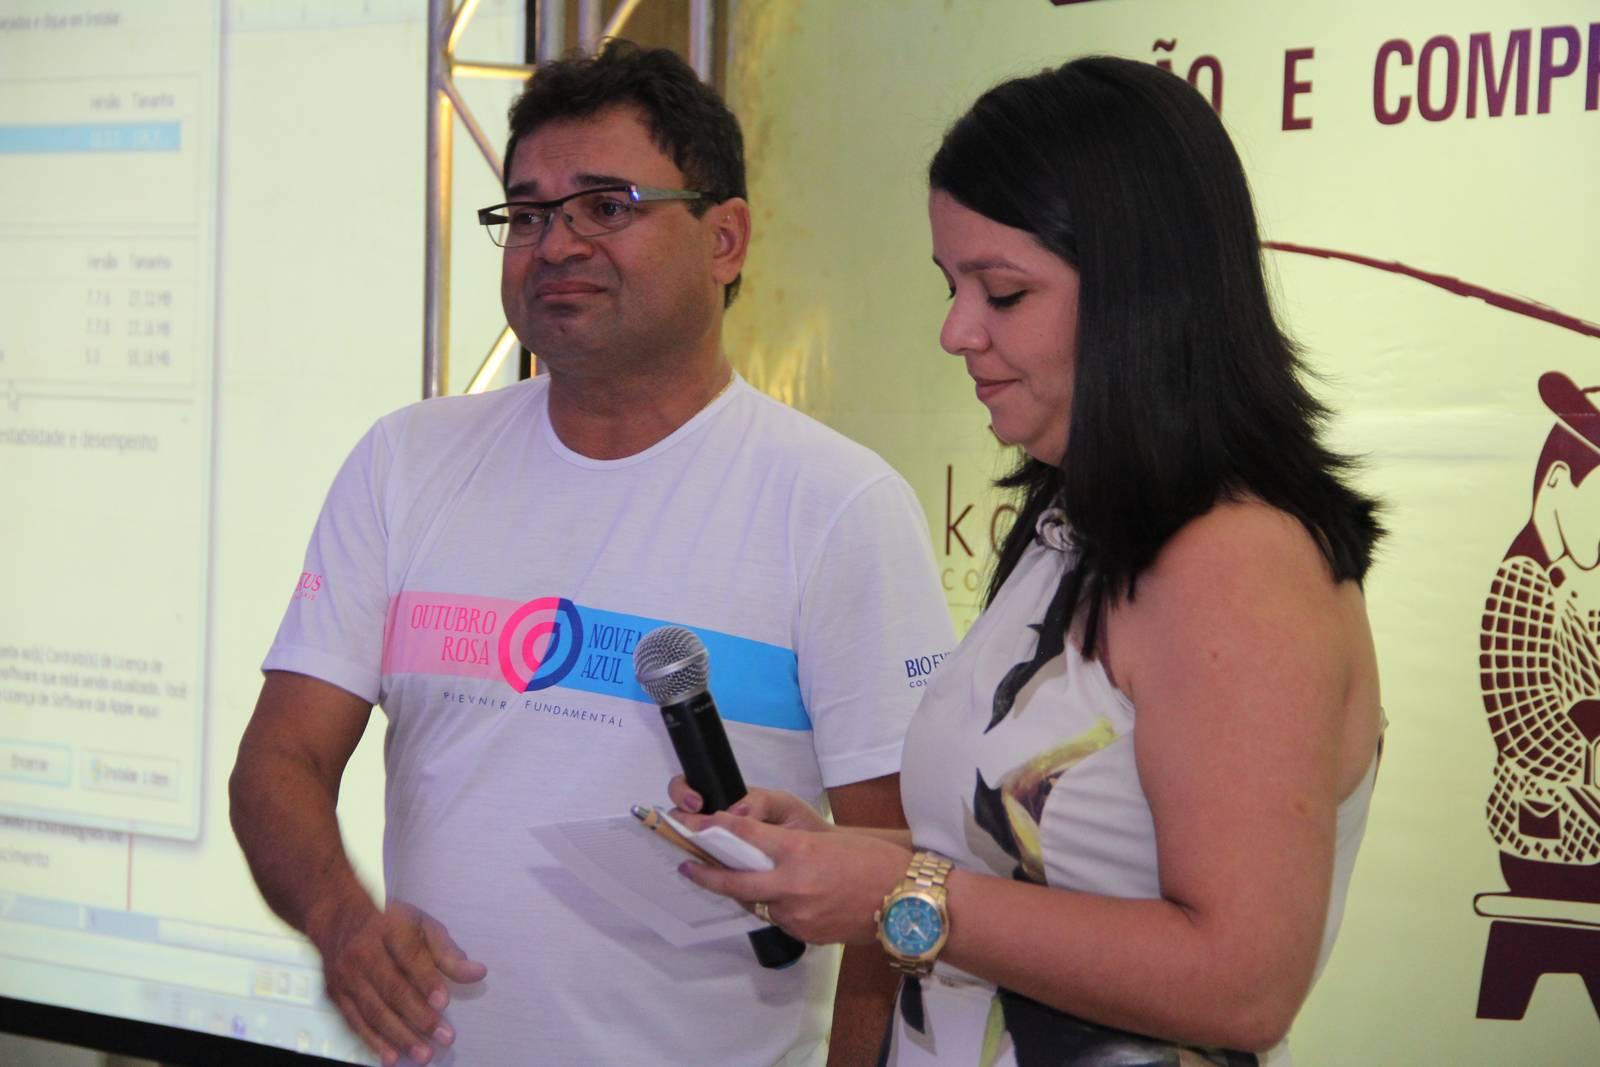 IV Encontro Regional do Nordeste - Bio Extratus (295)